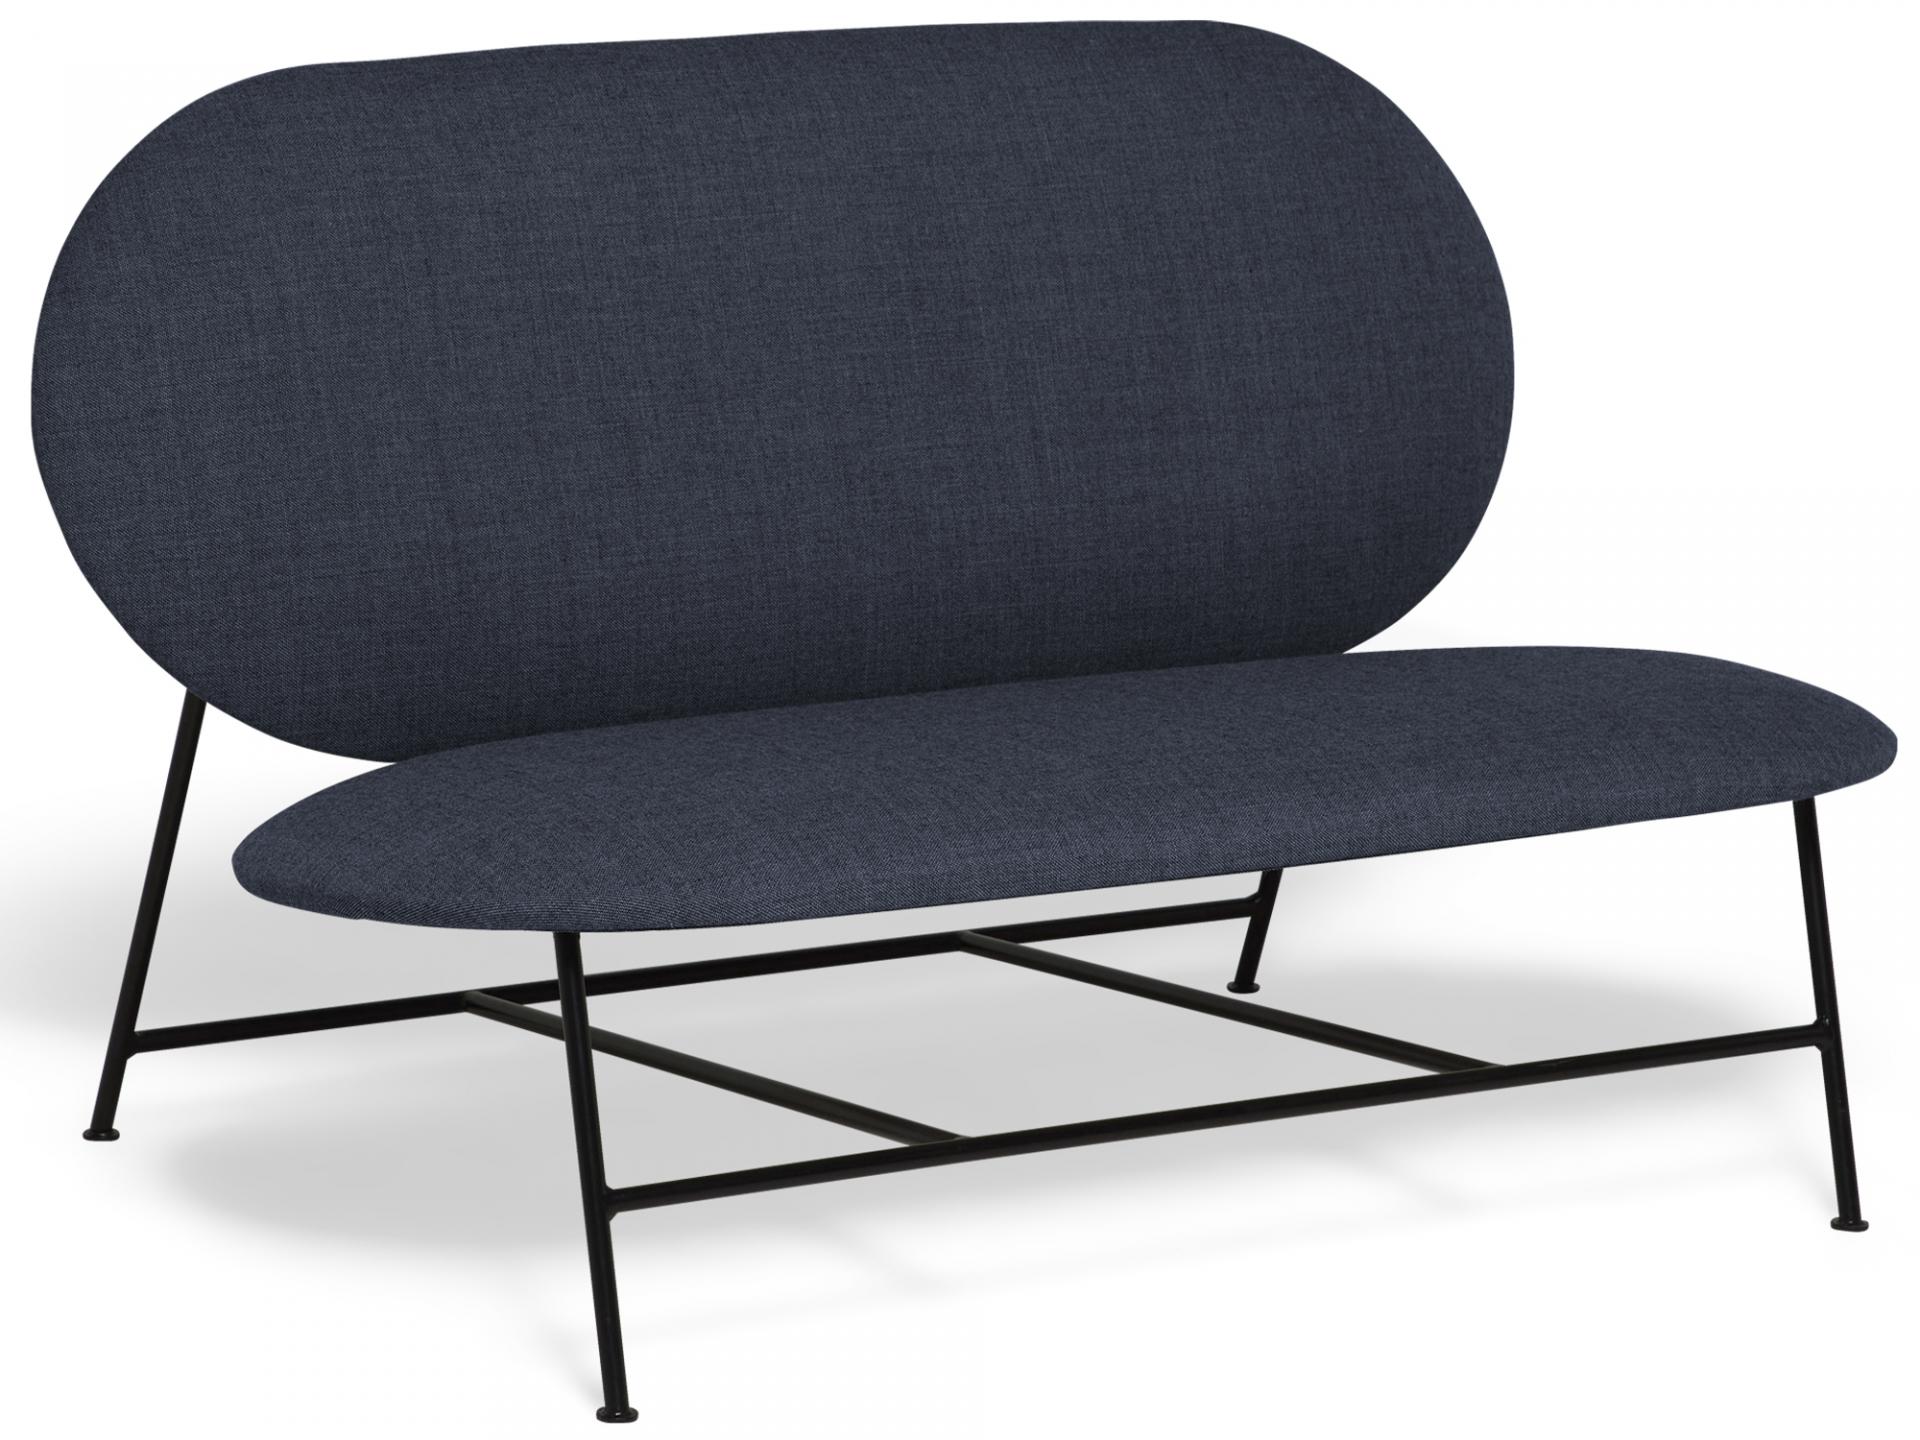 Northern designové sedačky Oblong Sofa